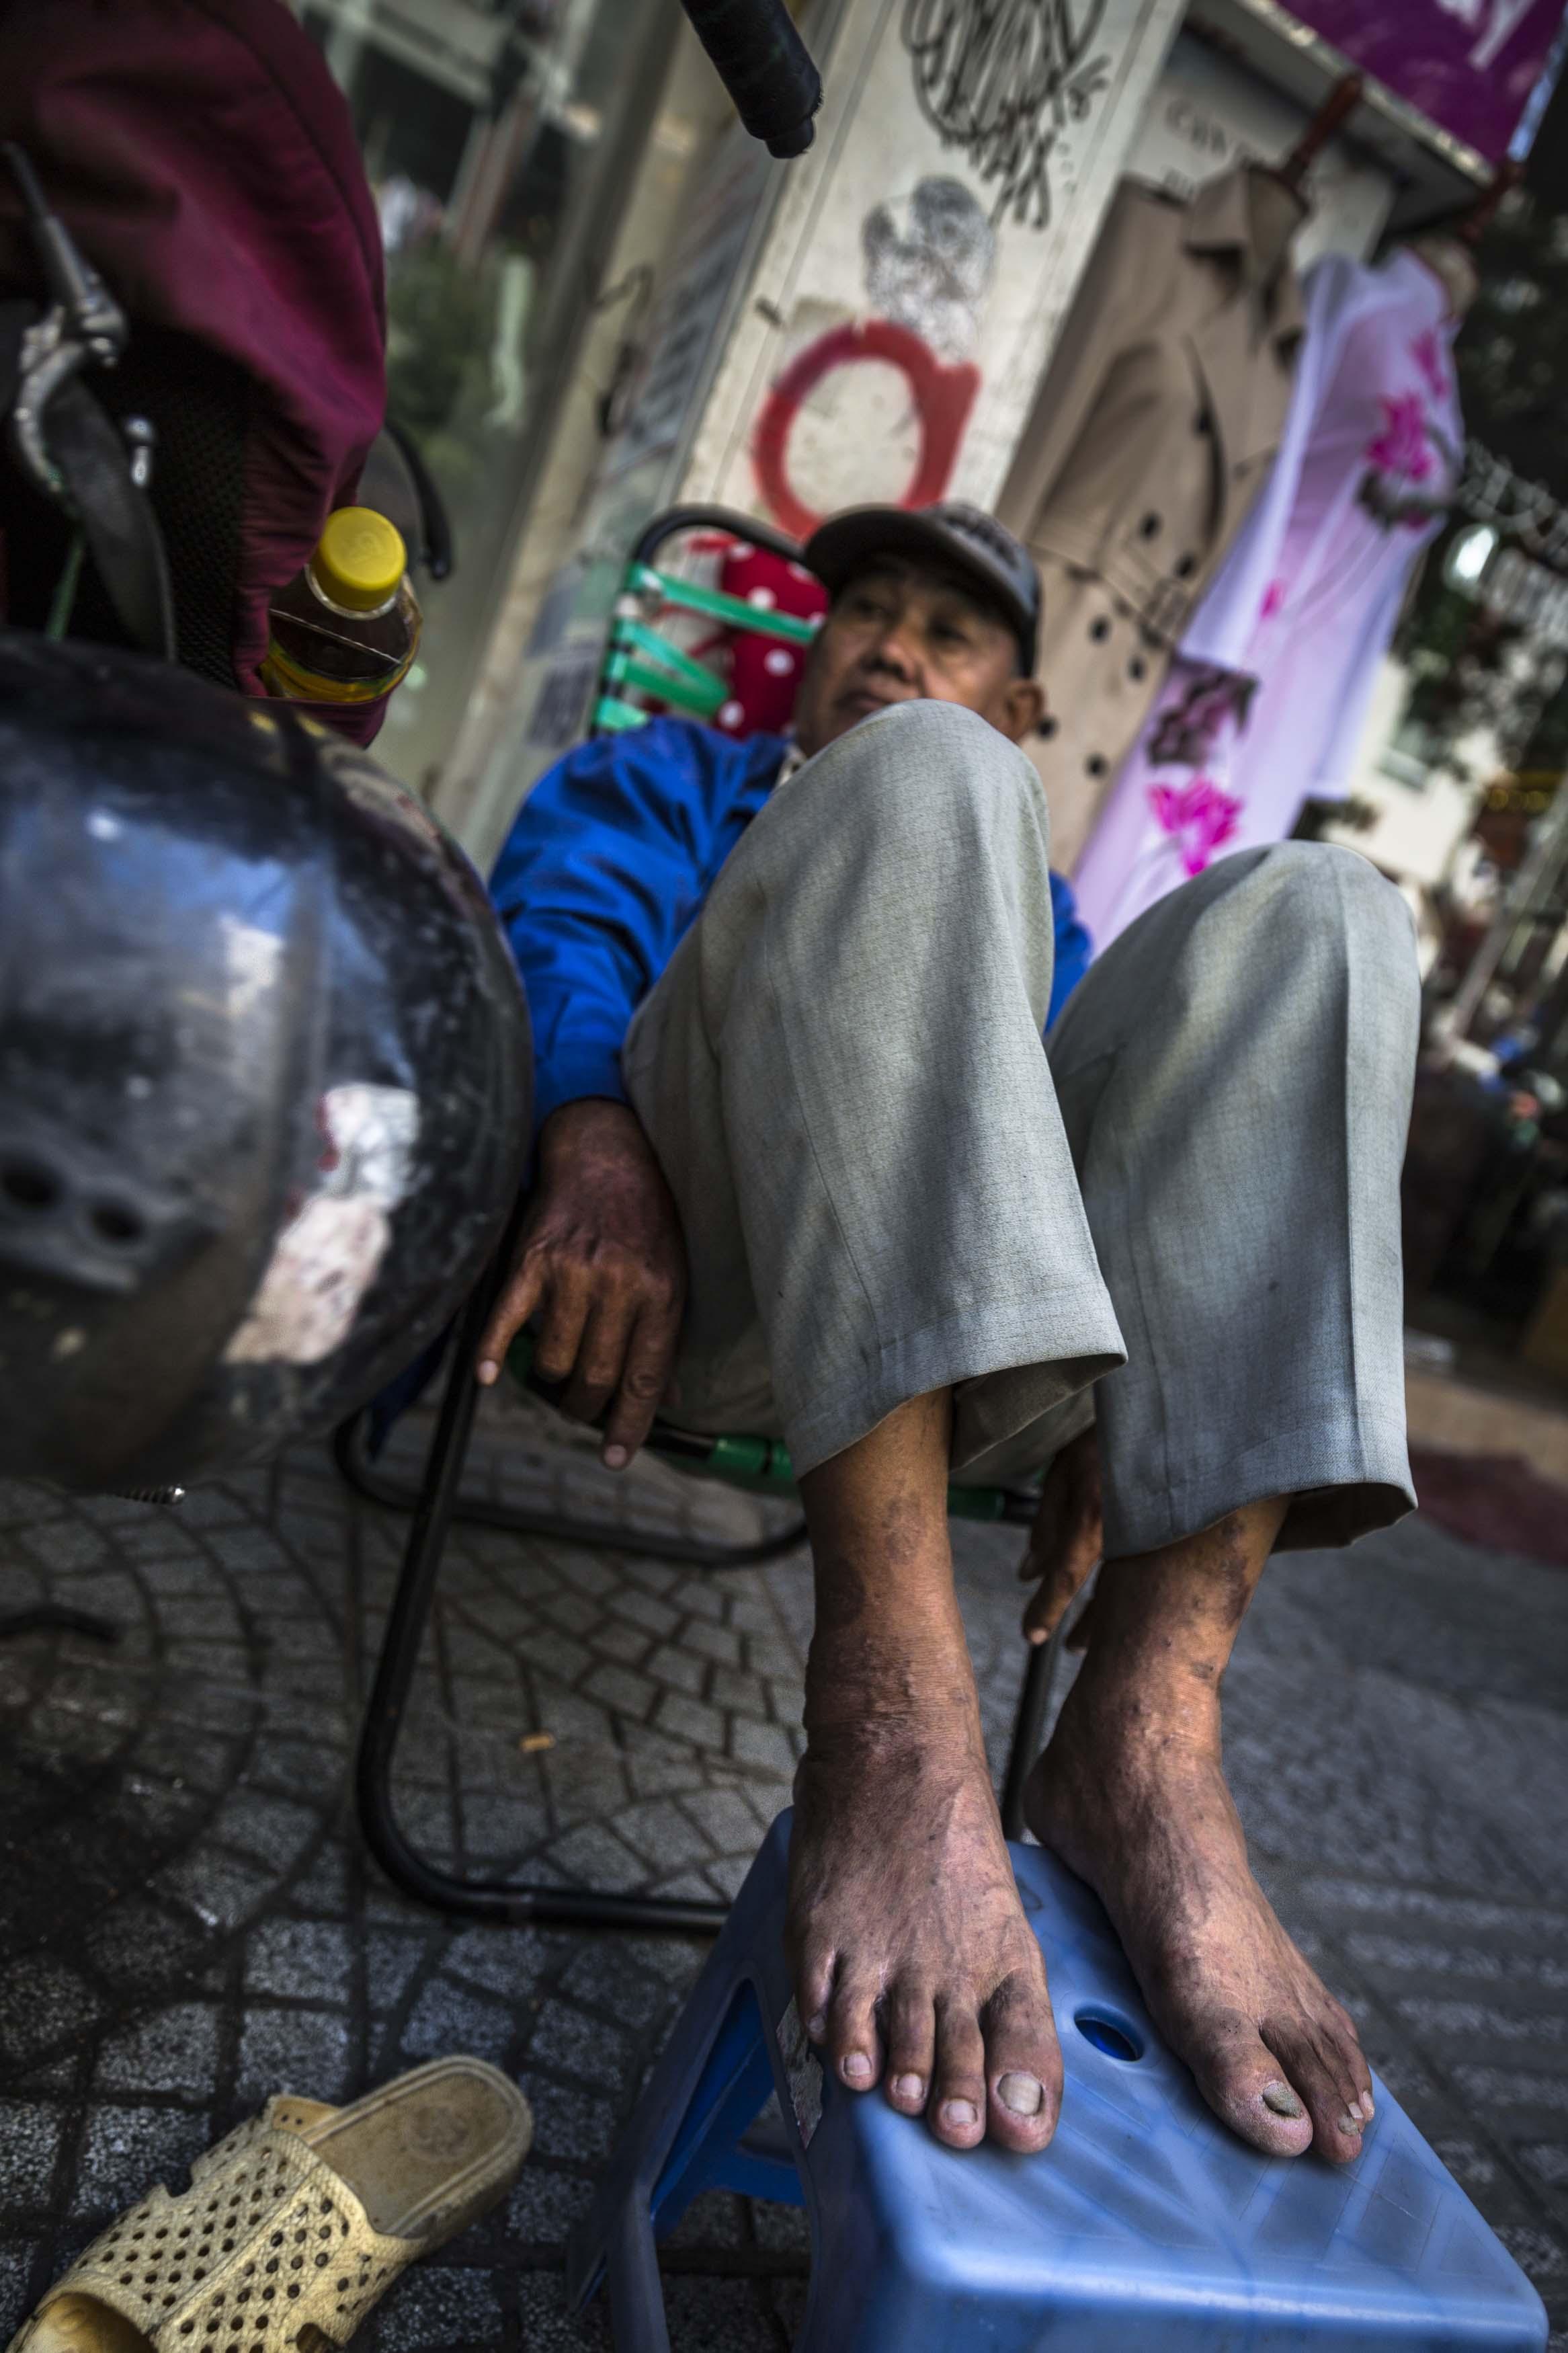 street-documentary-photography-fabio-burrelli-39.jpg